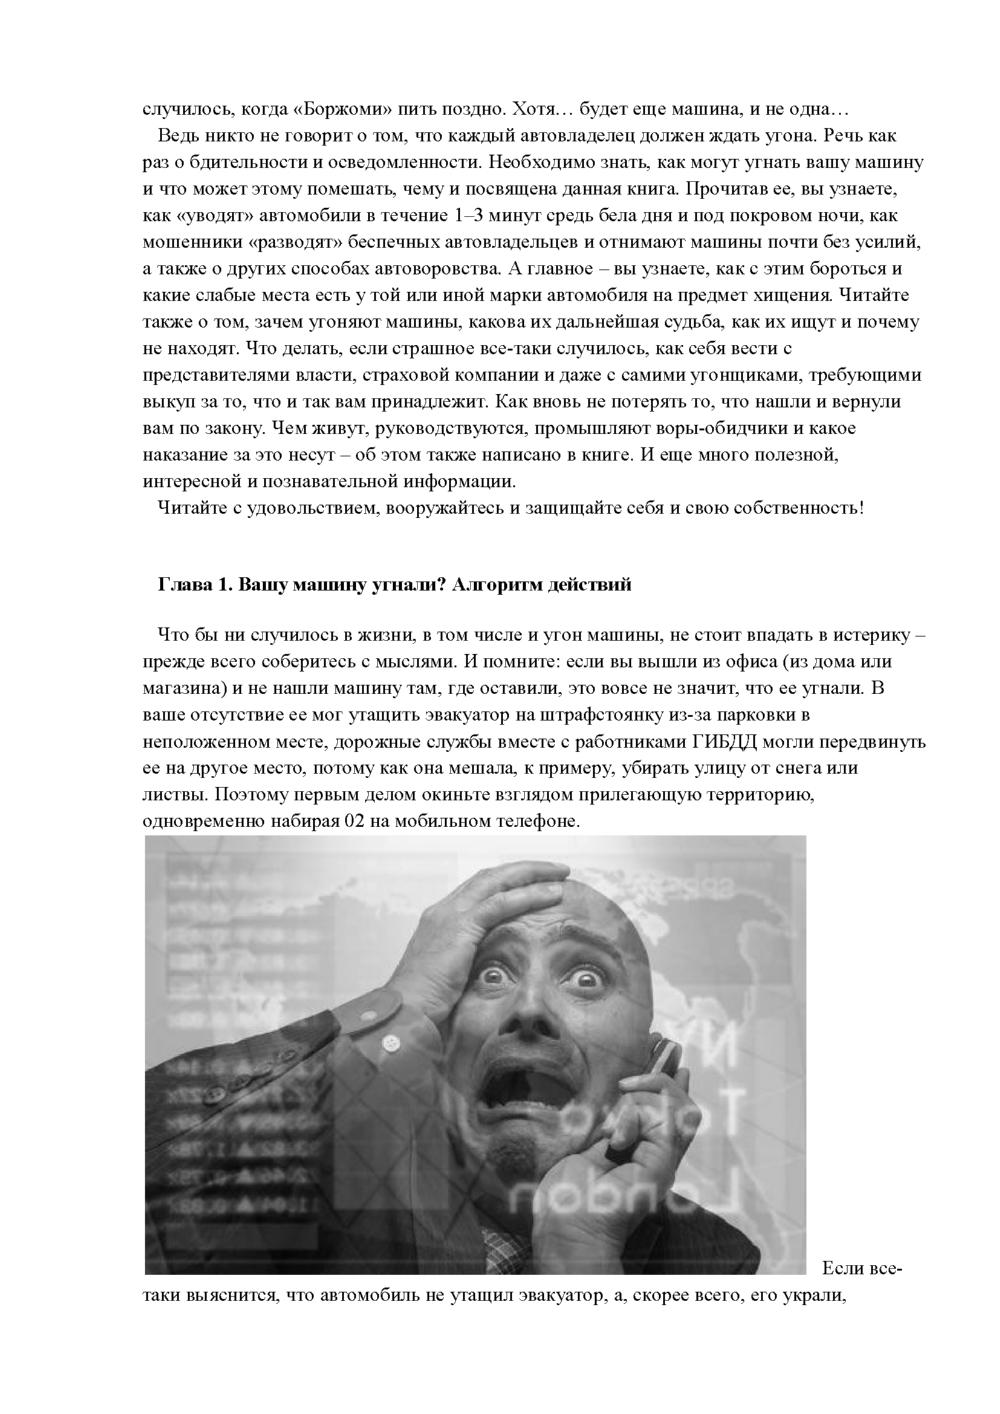 http://i6.imageban.ru/out/2013/12/05/5c617d5b9806c288eff03904a1dea6c4.jpg